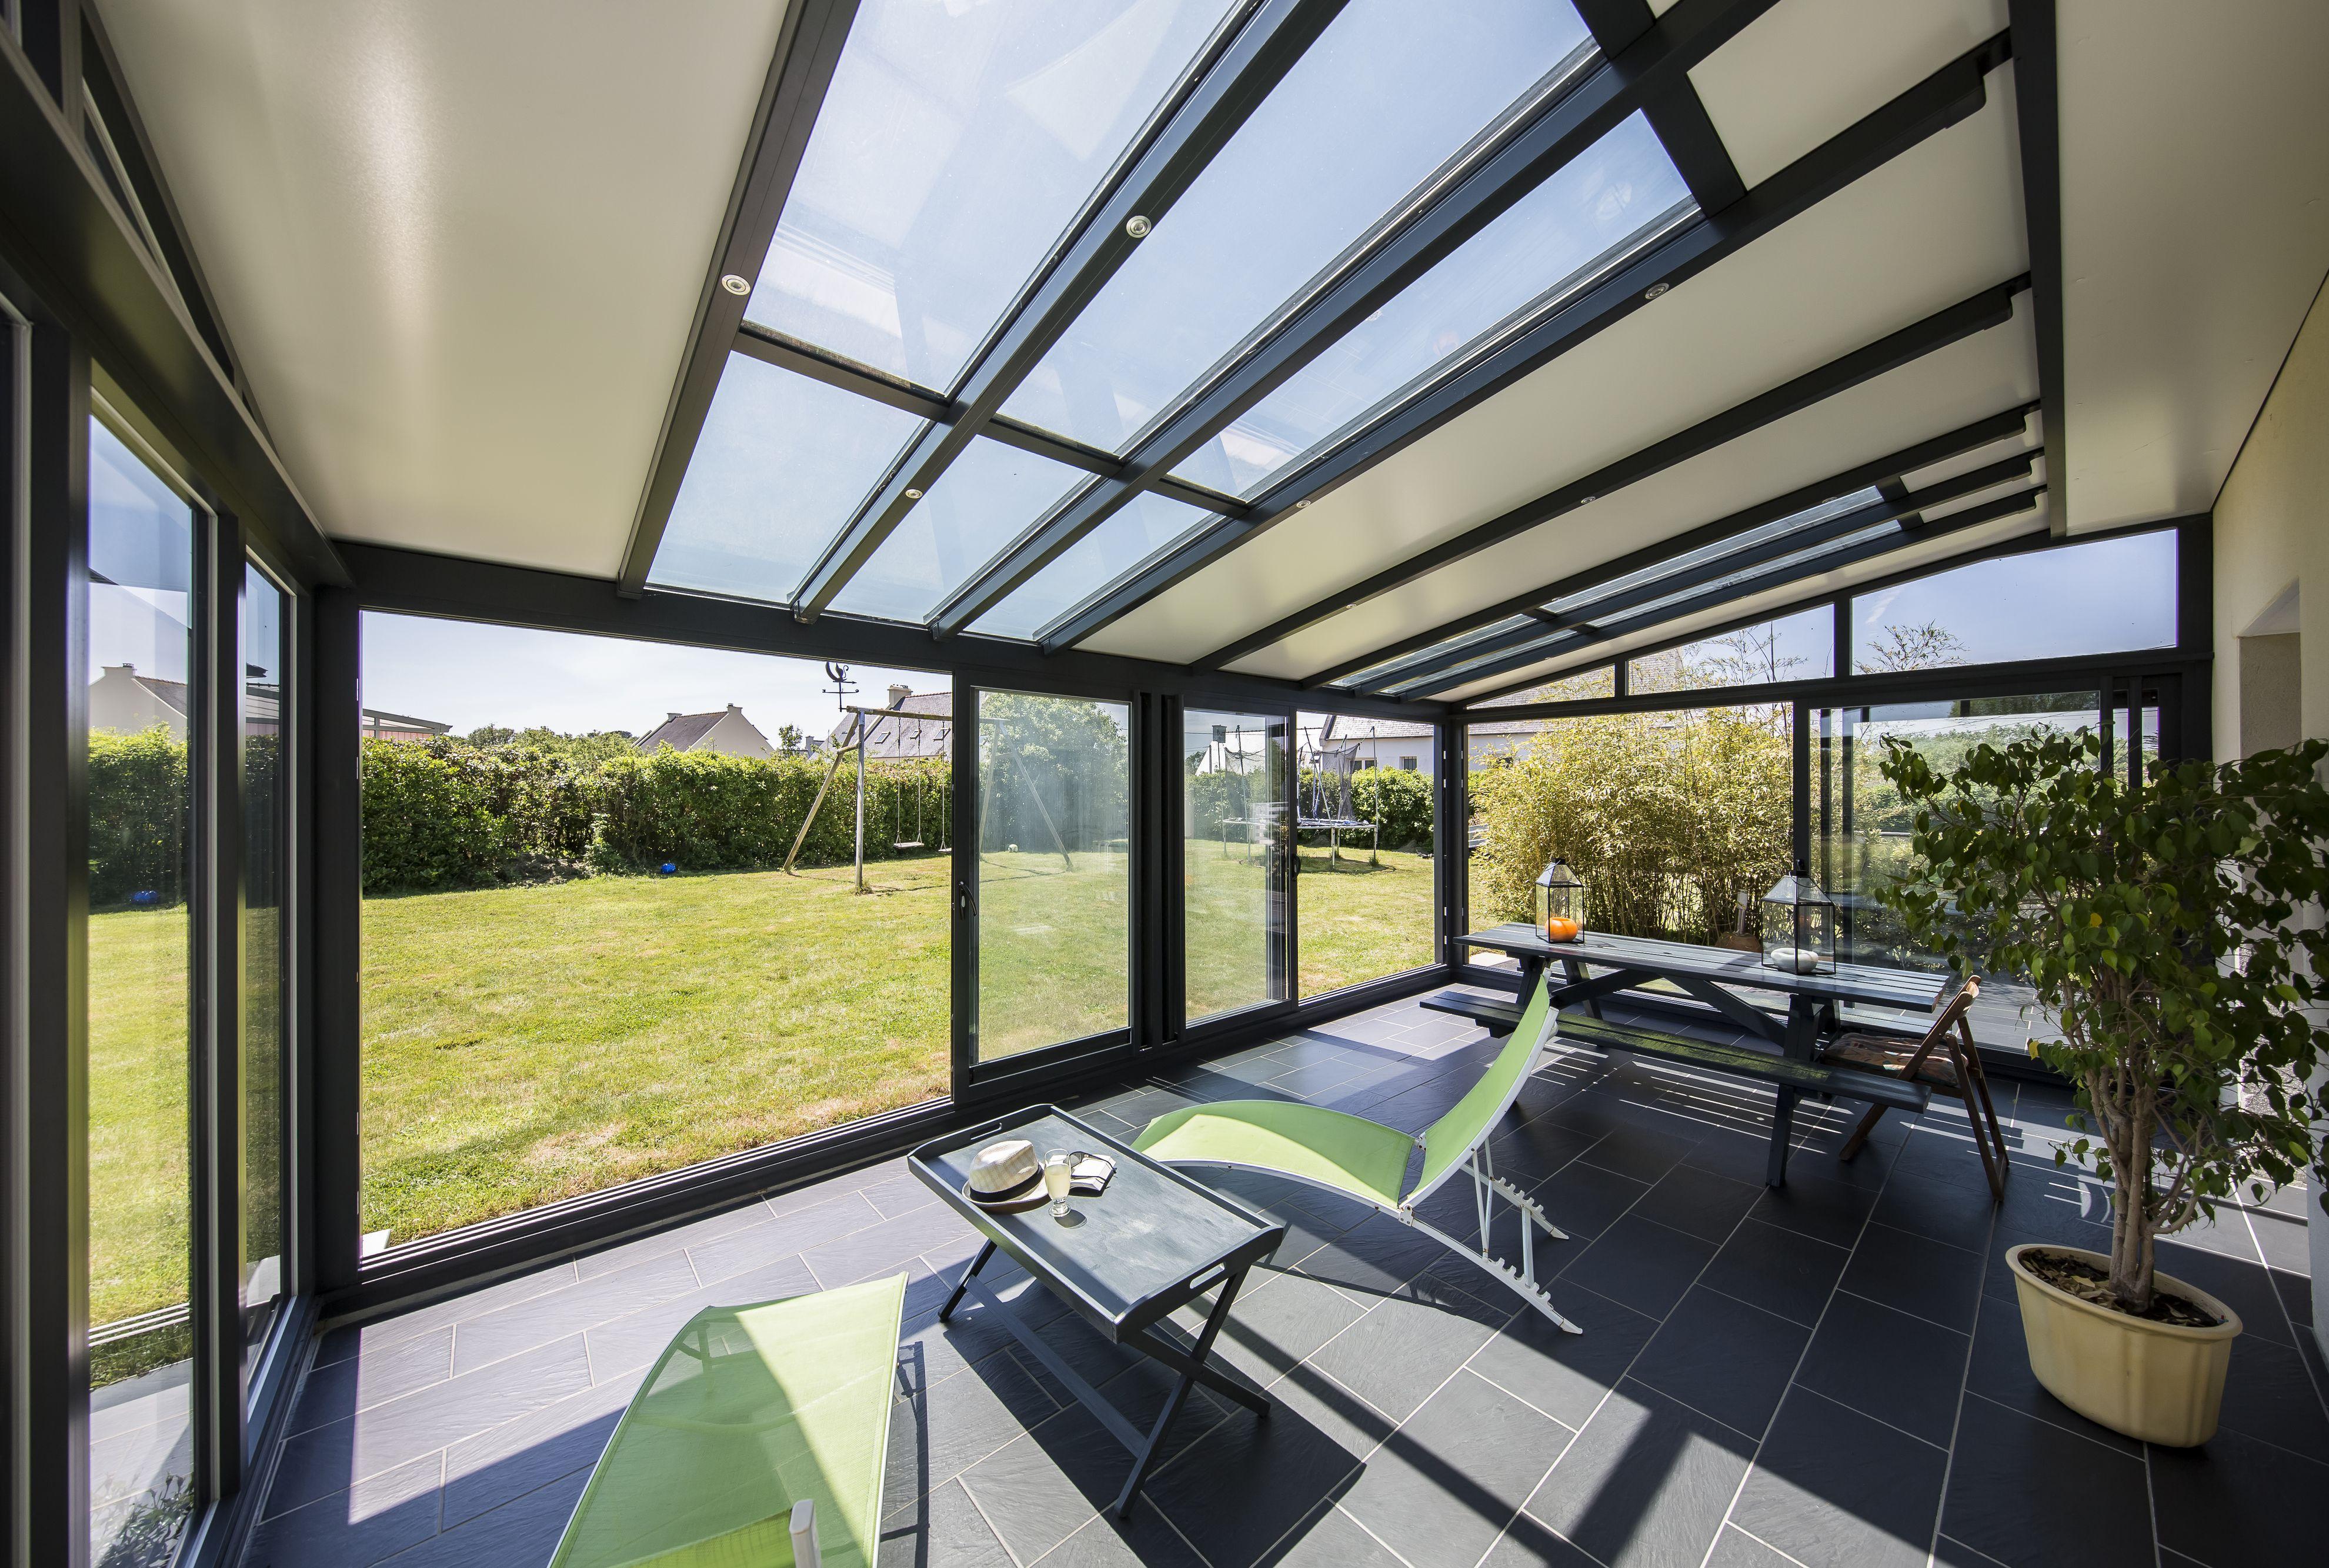 Toiture de véranda - Véranda à toit plat ou à toit en verre - Soko